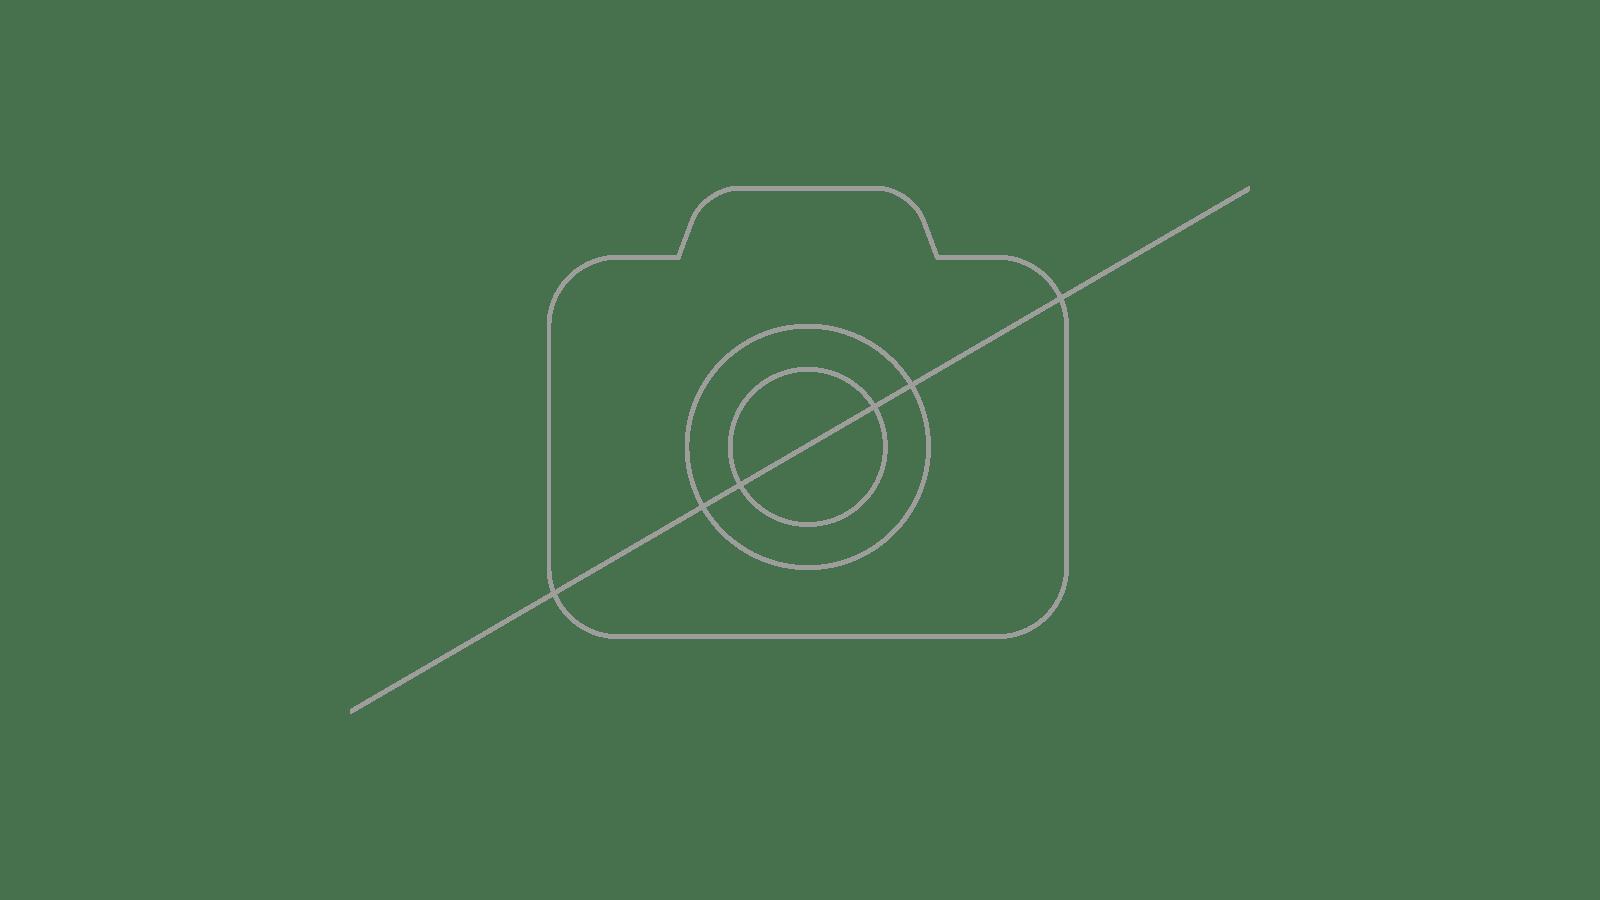 Serie | 6 Встраиваемый духовой шкаф 60 cm Нержавеющая сталь HBJ558YS0Q